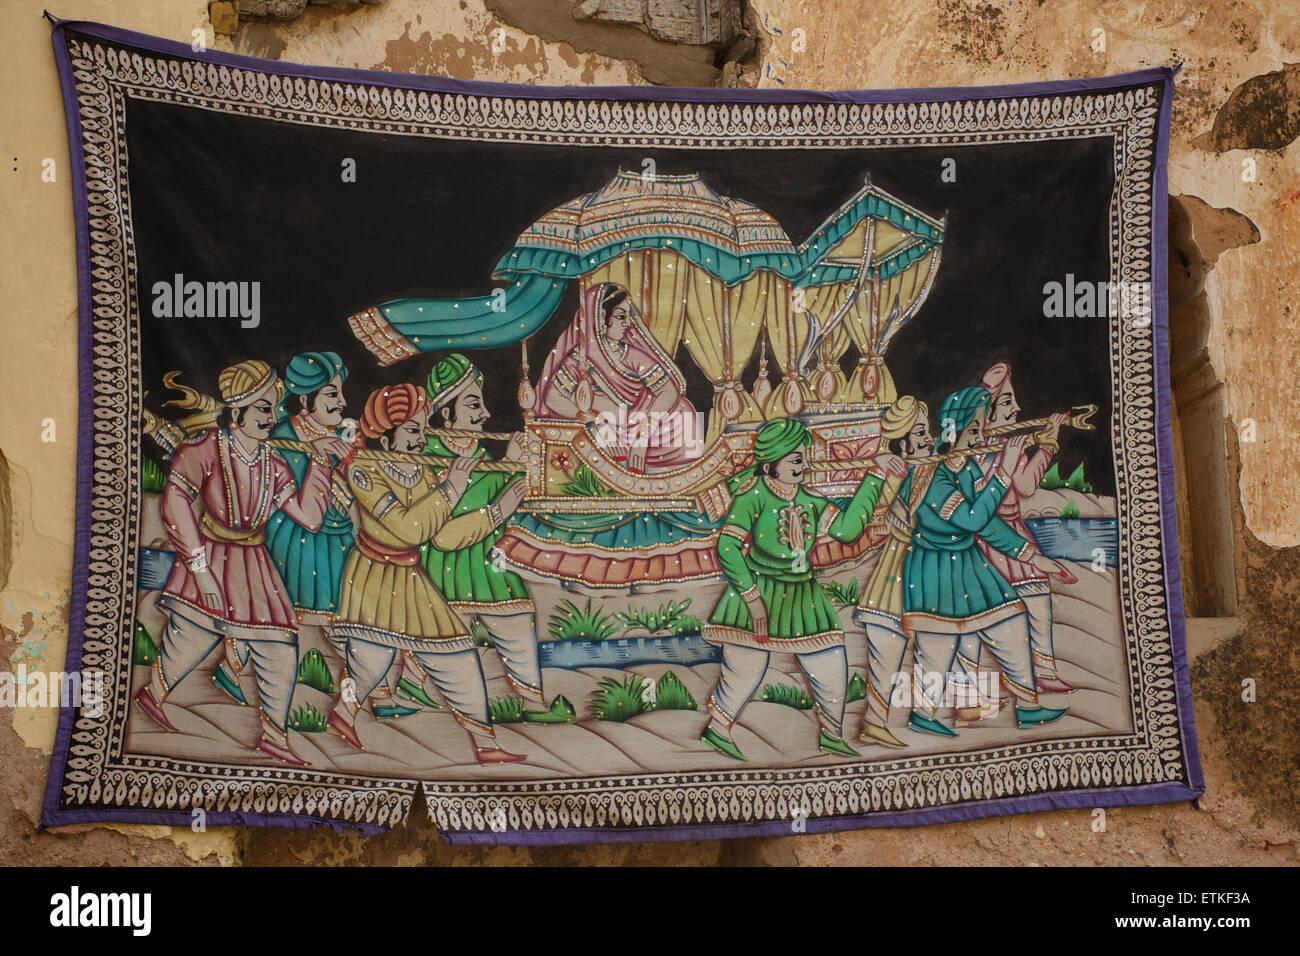 Indian textile souvenir. Mandawa, Shekawati region, Rajasthan India - Stock Image